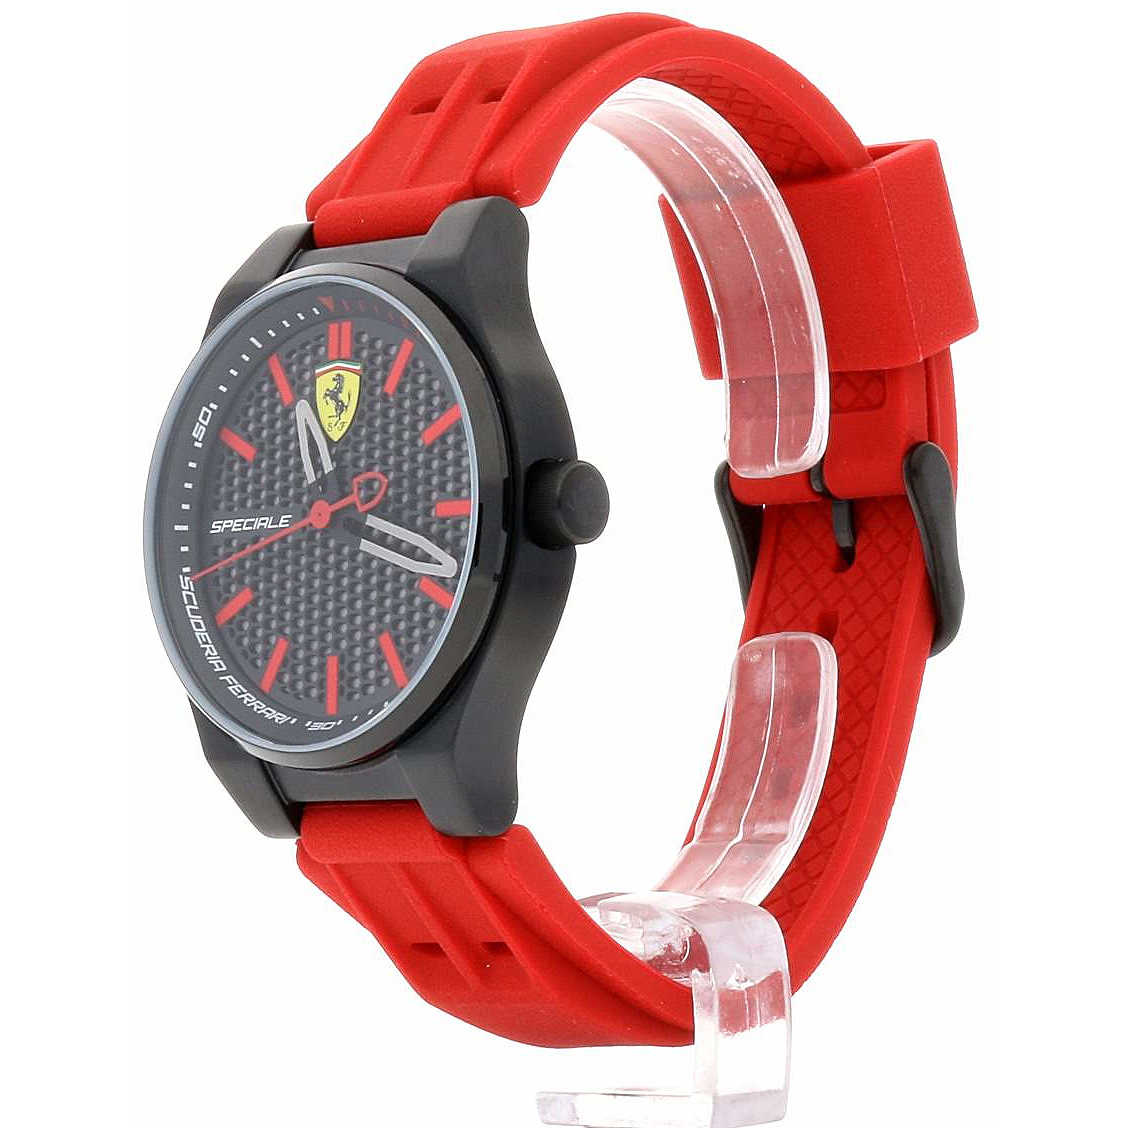 replica uk giappone sale big new presented titanium for bang hublot cases watches ferrari